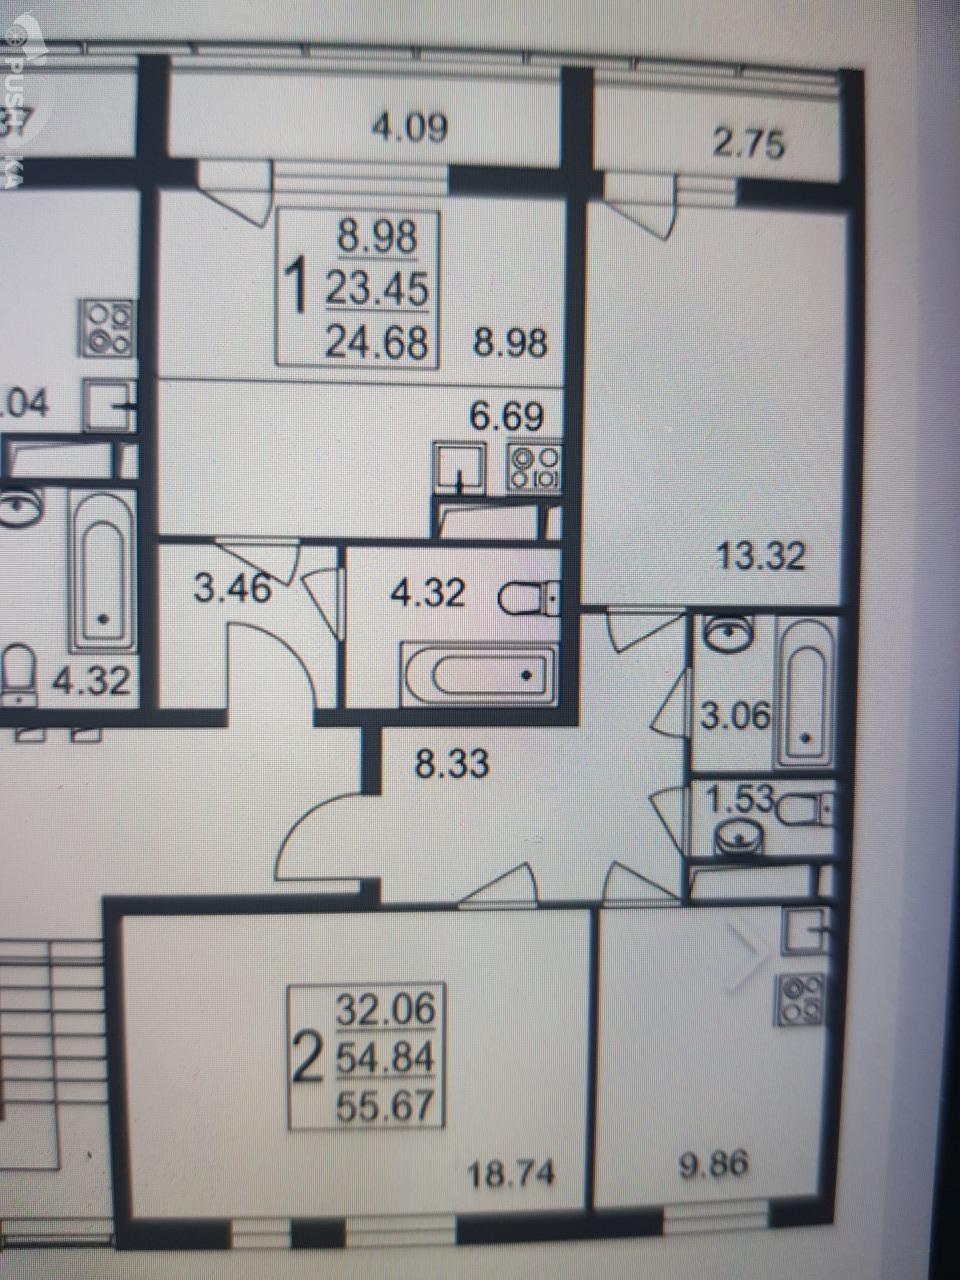 Продаётся 2-комнатная квартира 55.3 кв.м. этаж 6/8 за 6 400 000 руб